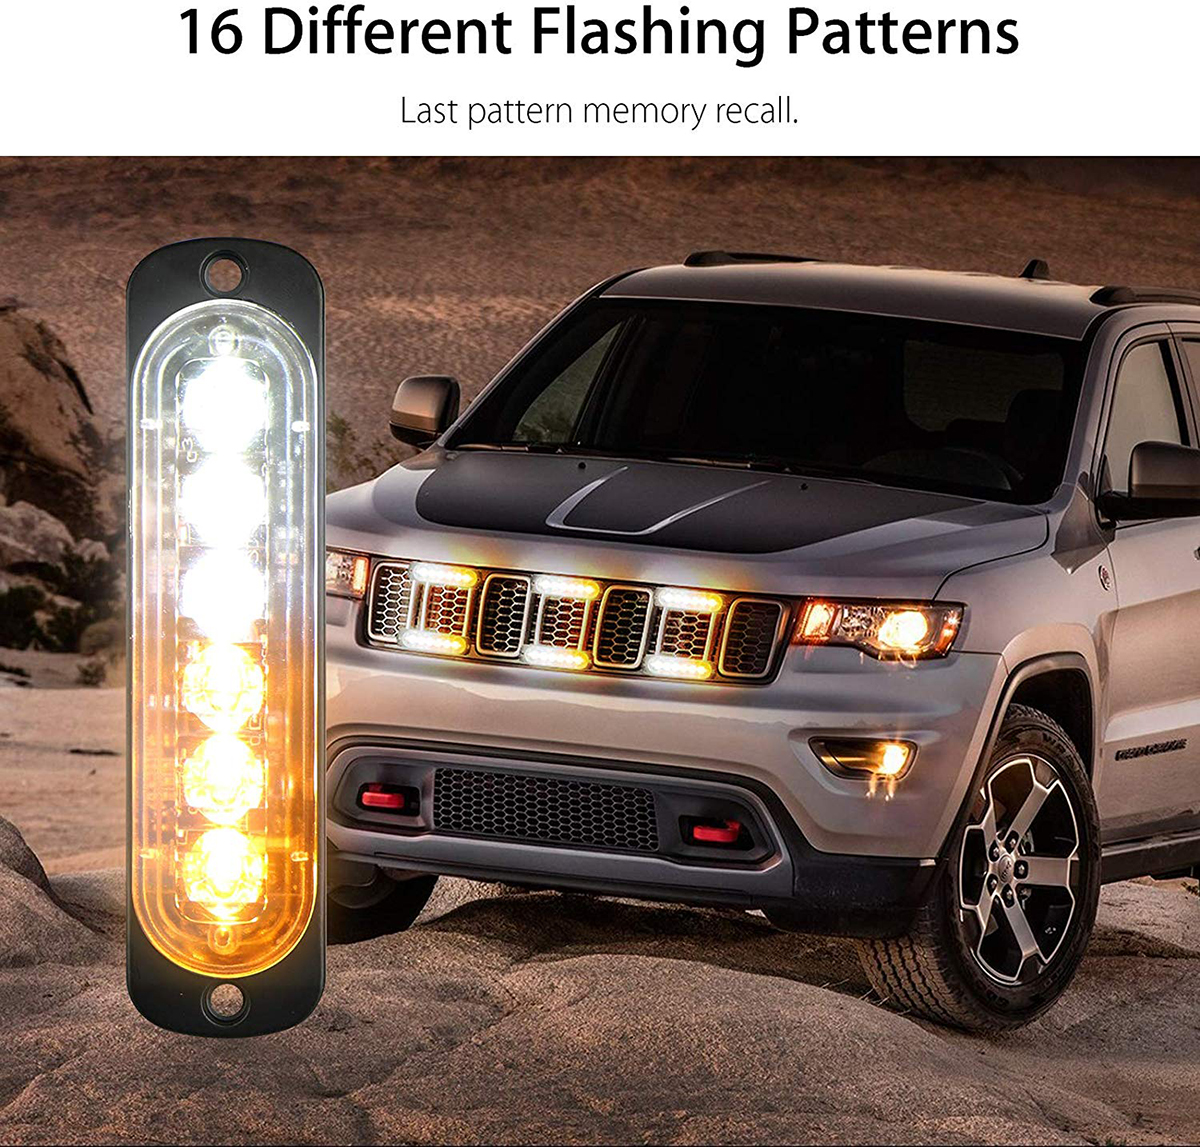 6 LEDs Emergency Light For Car Warning Flashing Firemen Police Emergency Light Ambulance Police Strobe Warning Light